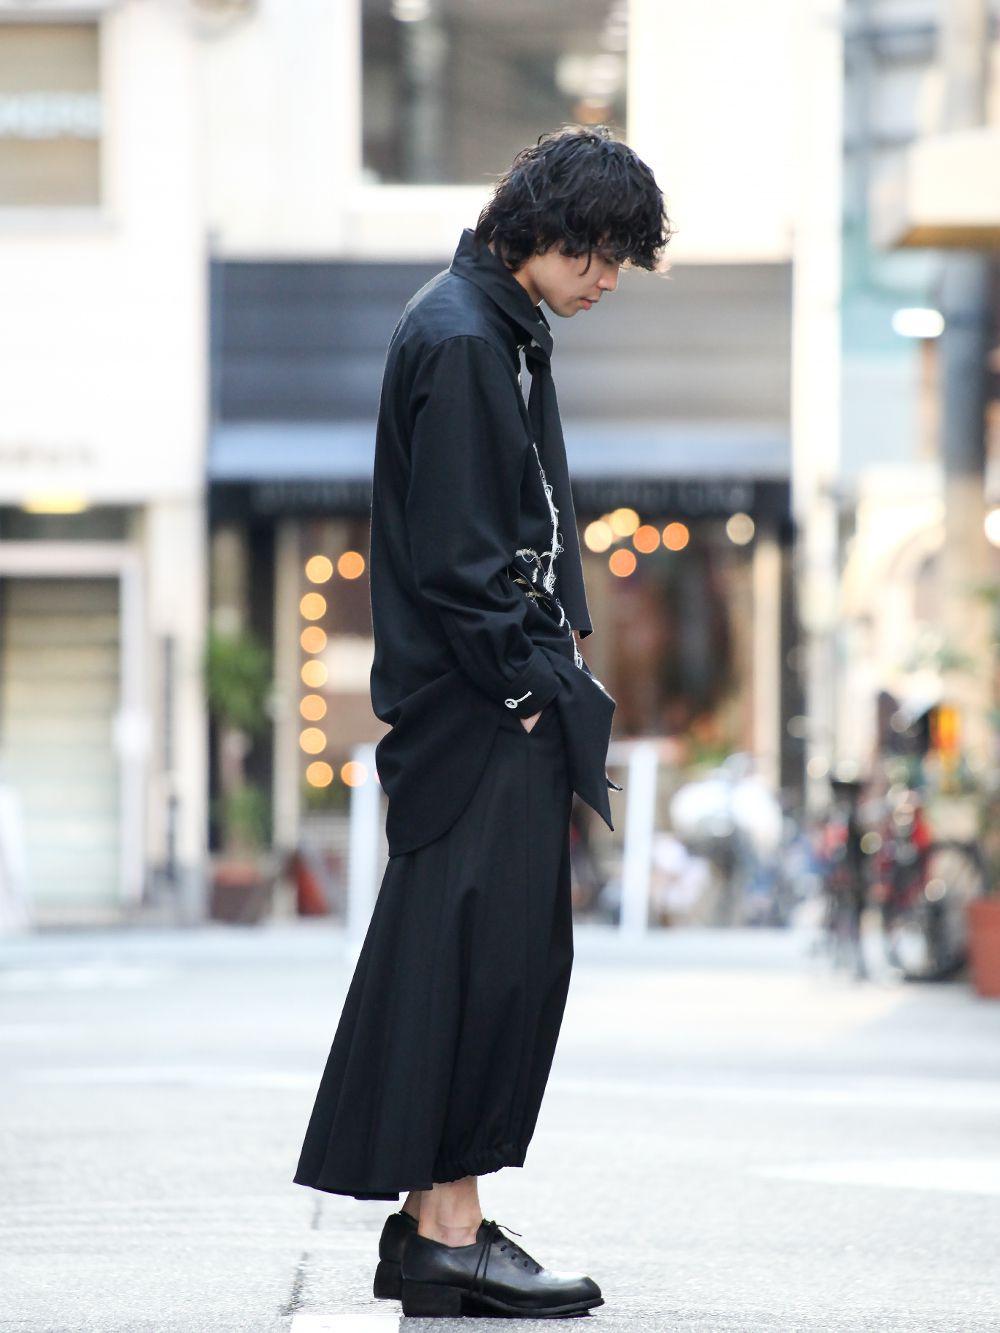 Yohji Yamamoto 19-20AW collection New Arrivals!! - 1-002